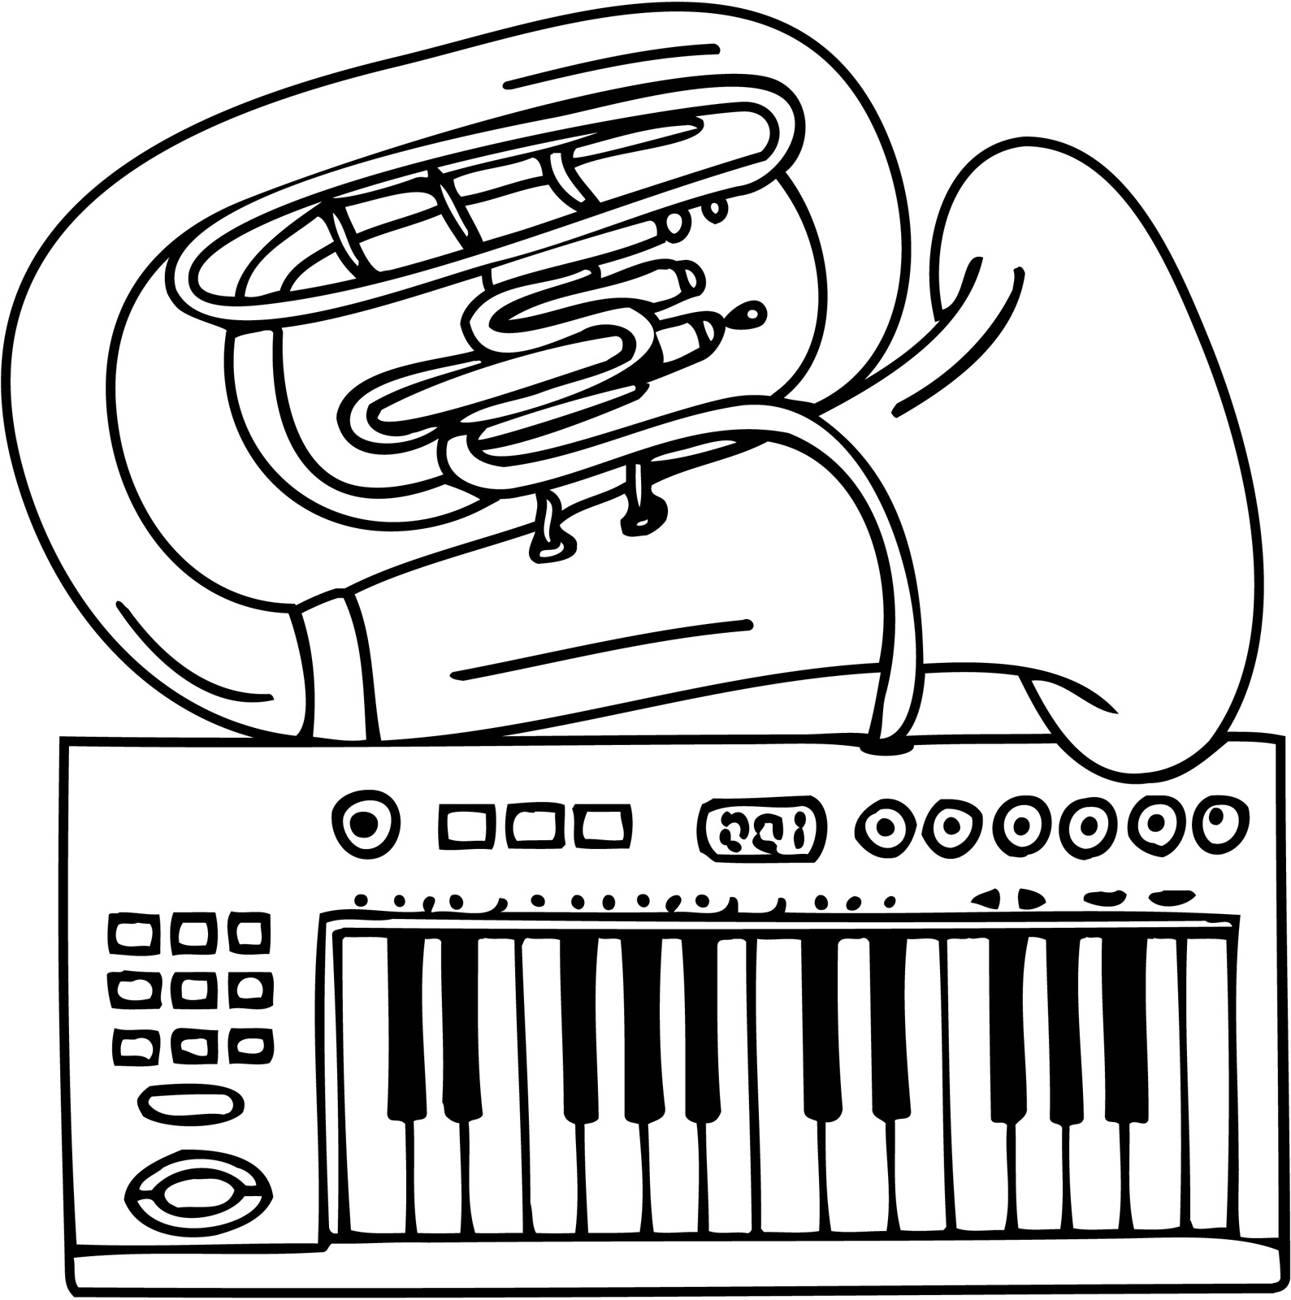 MUSIC-074